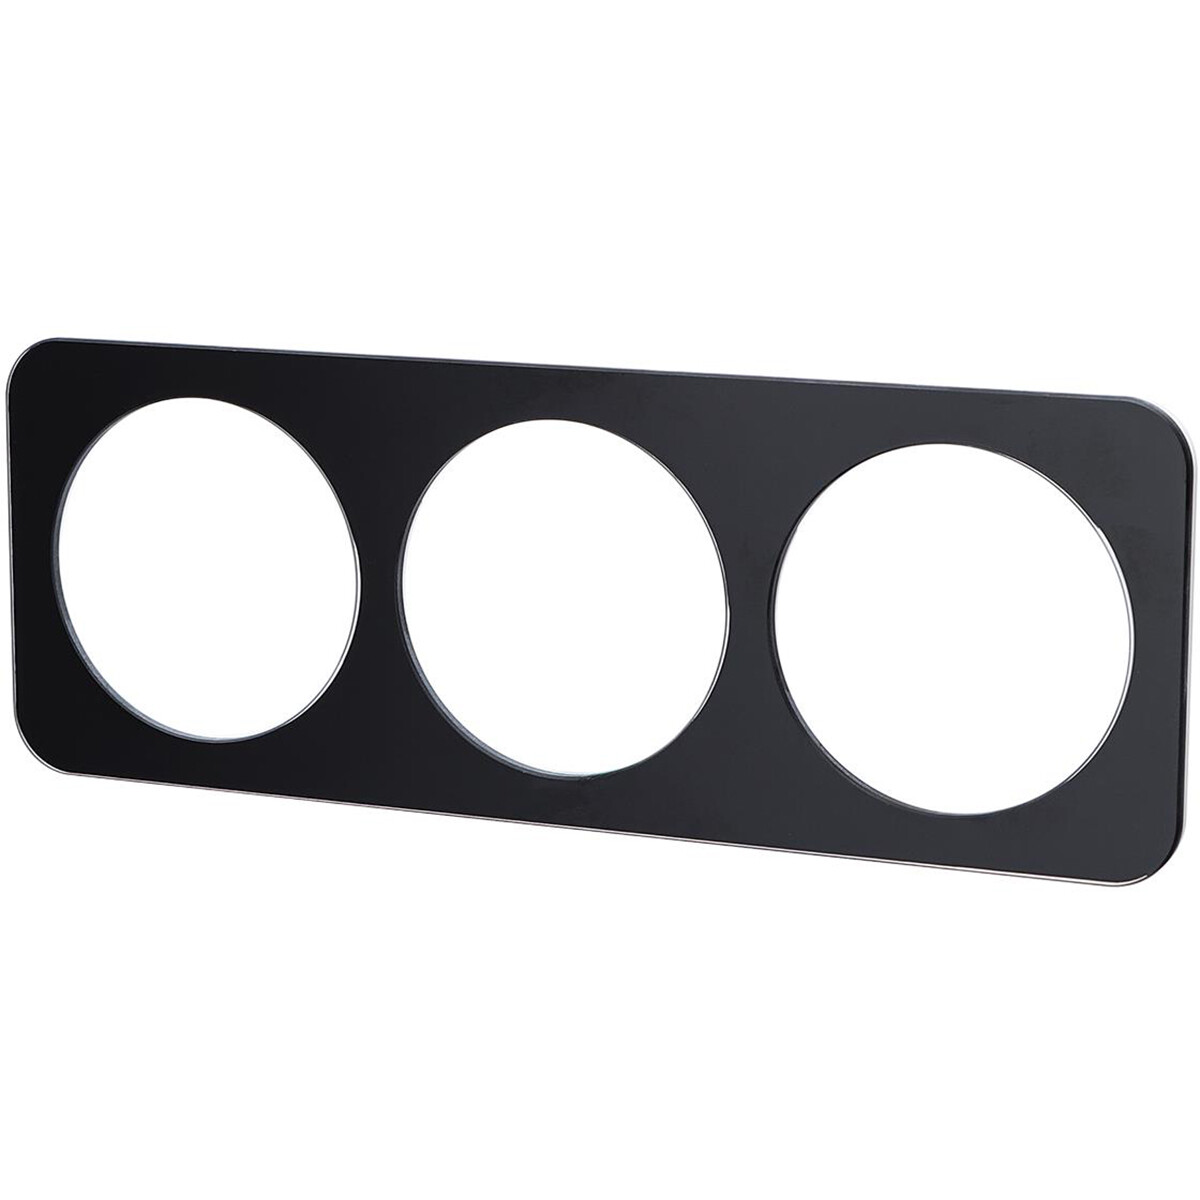 Afdekraam - Aigi Jura - 3-voudig - Rond - Glas - Zwart